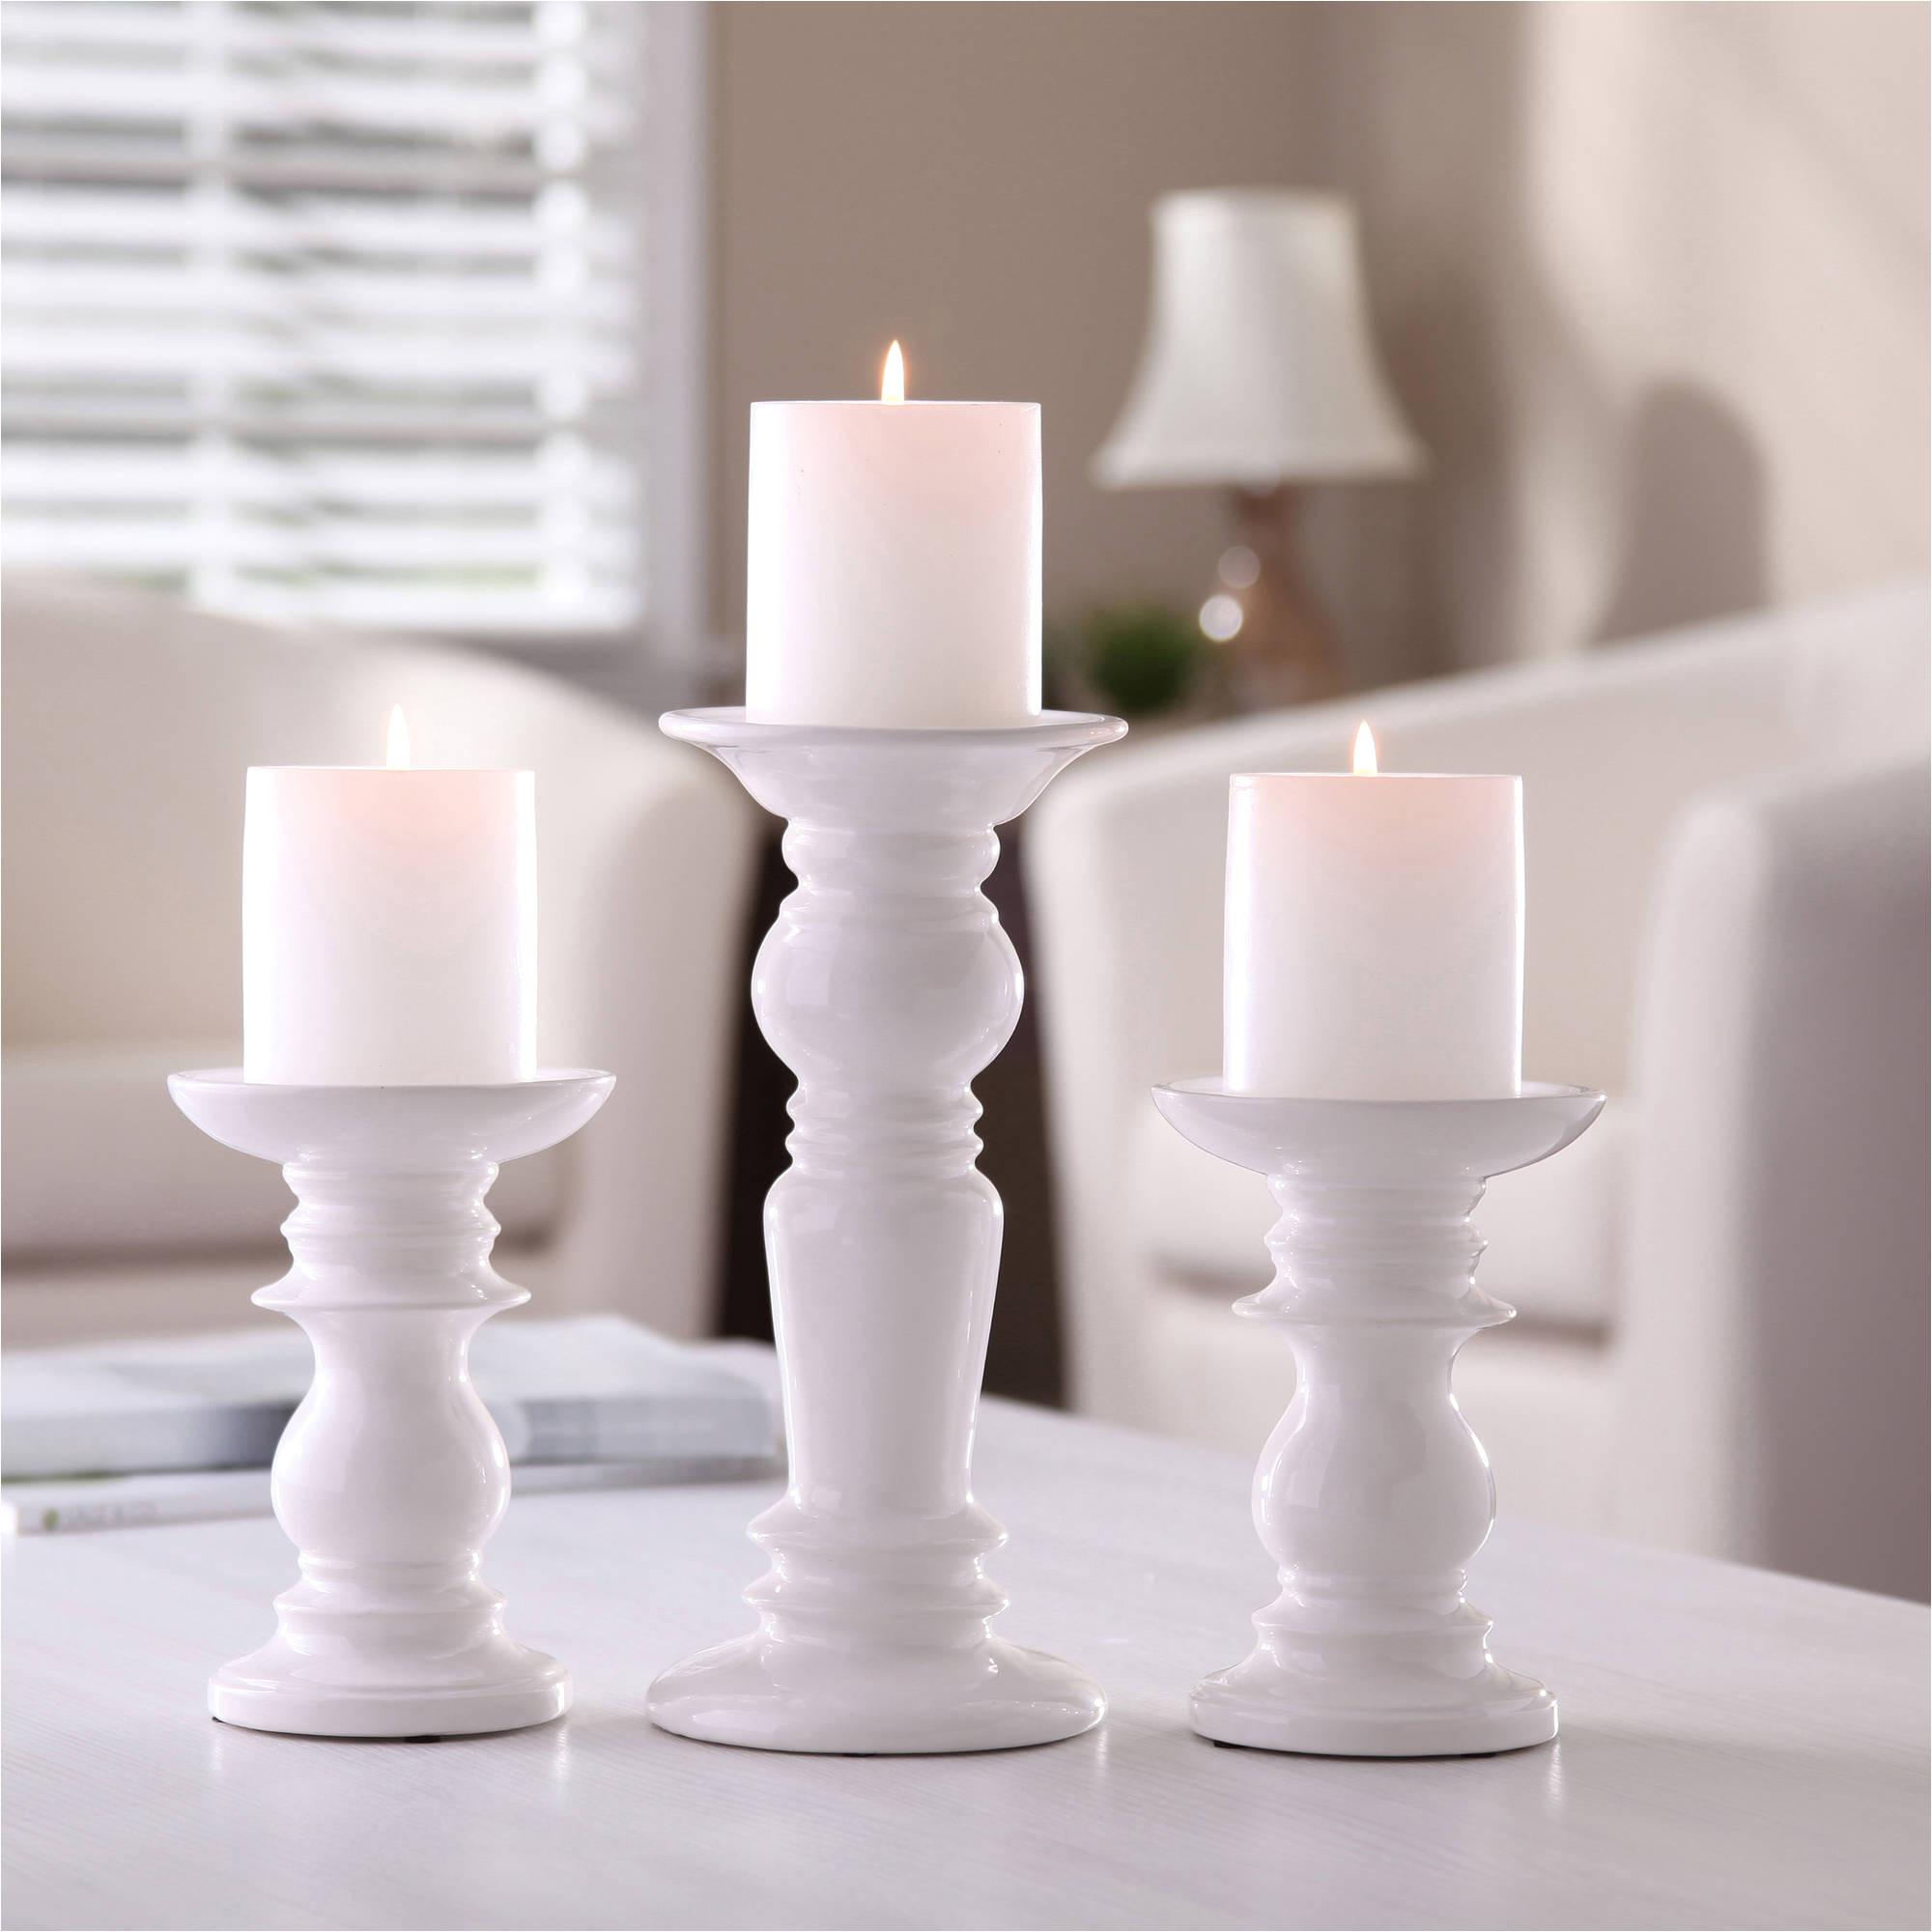 better homes gardens ceramic pillar candle holders set of 3 walmart com